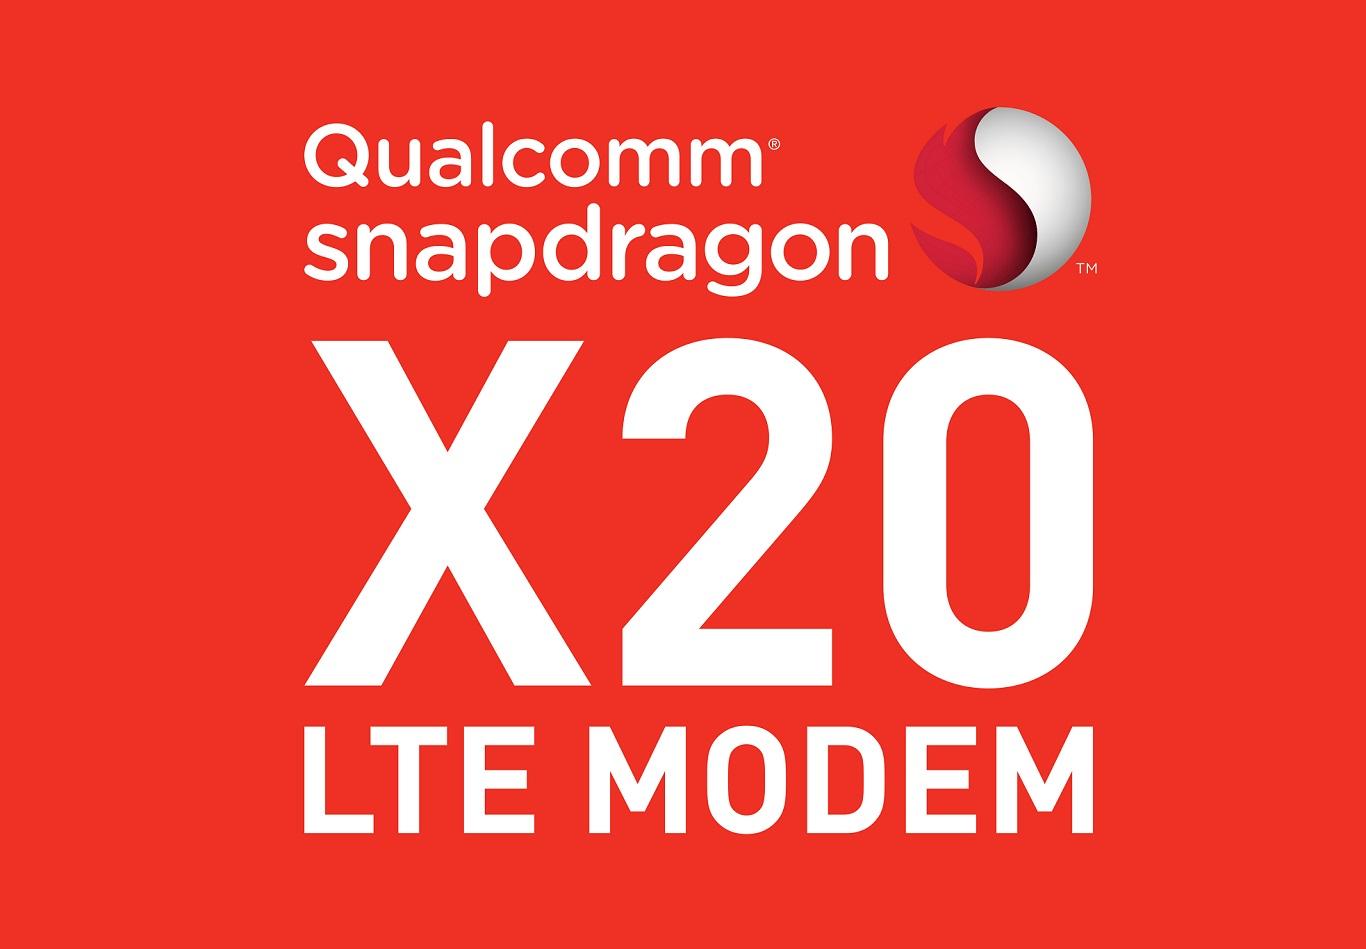 qualcomm, modem, snapdragon x20, lte modem